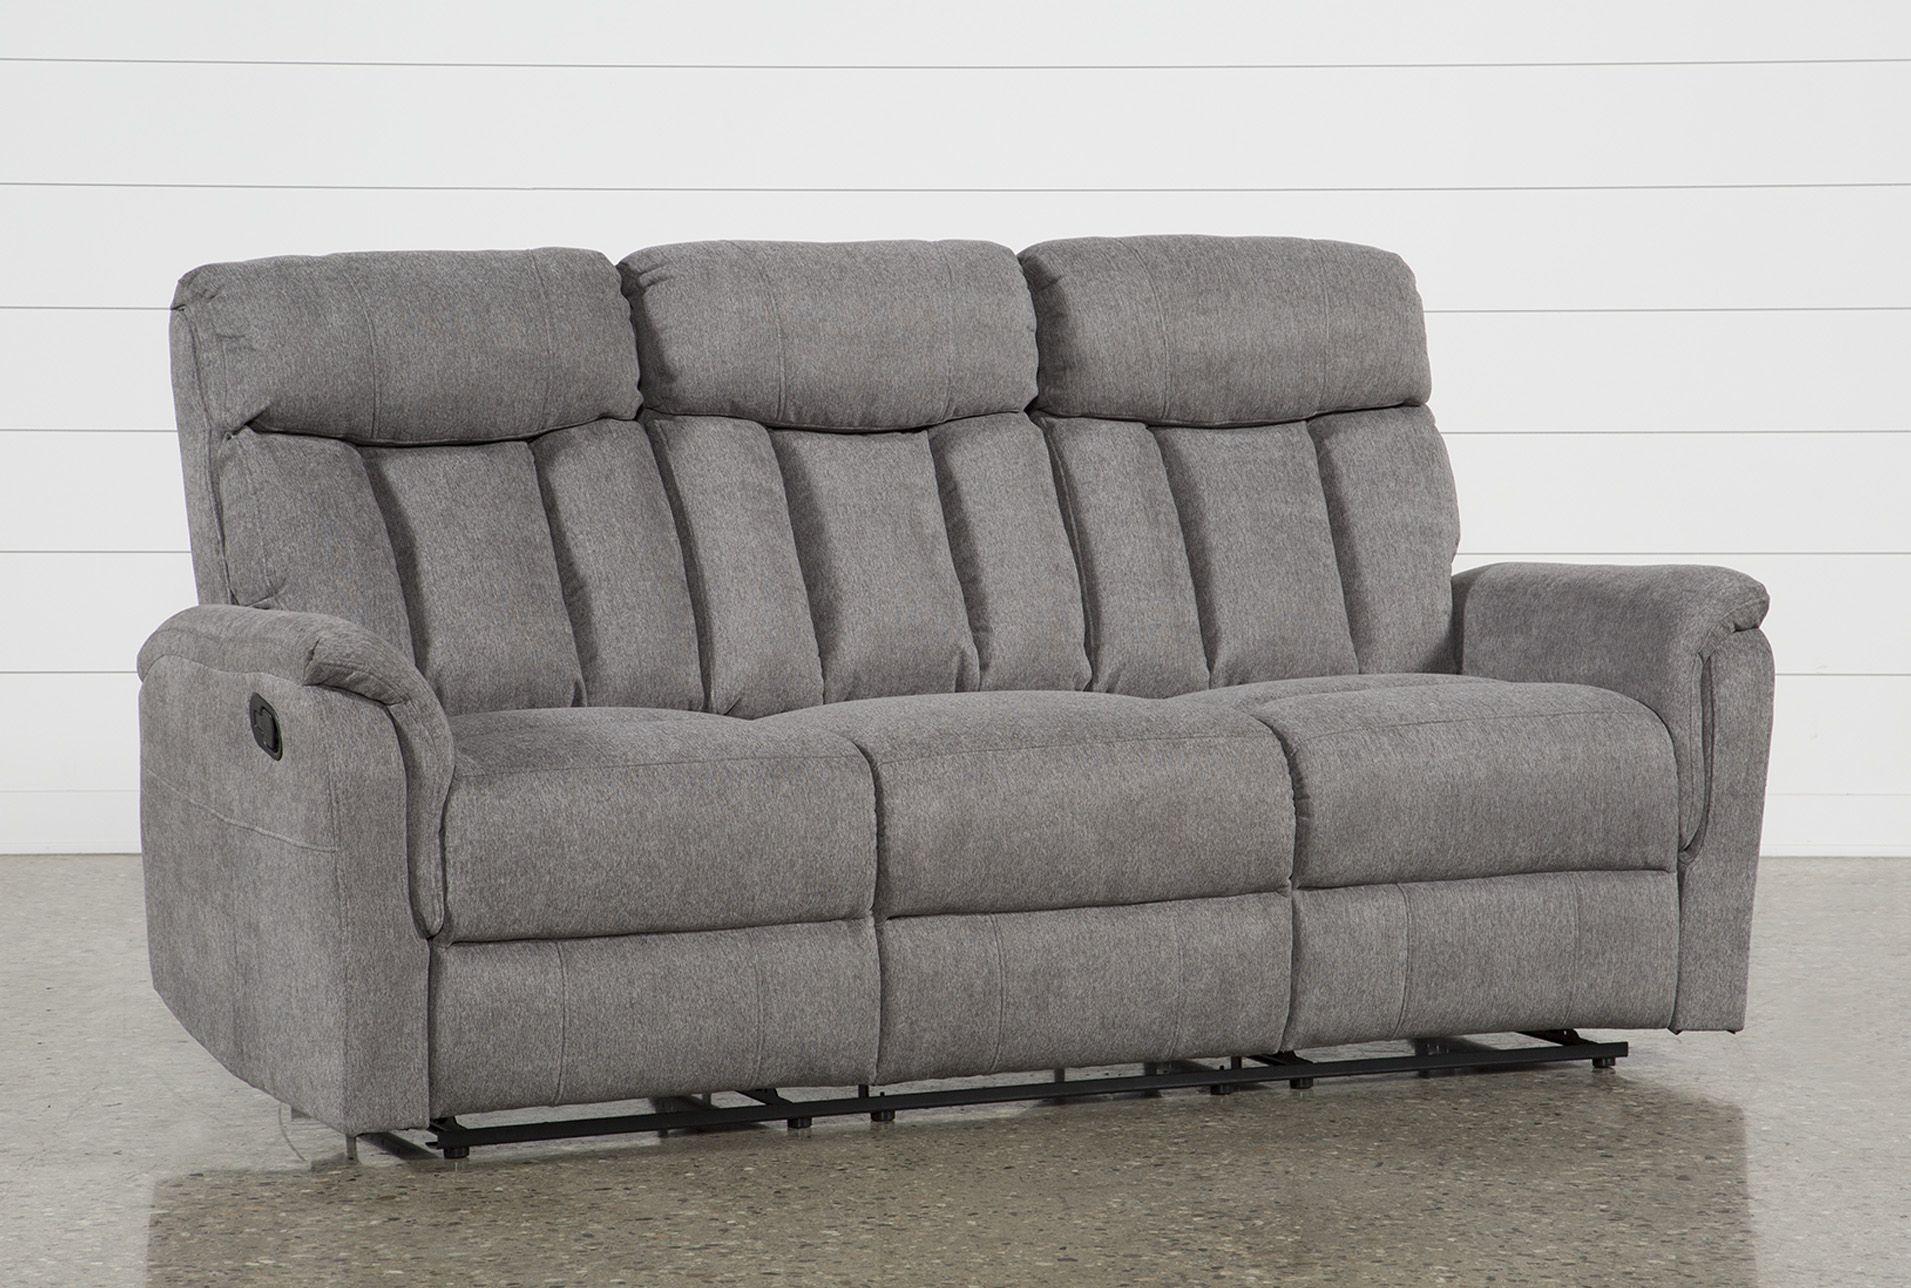 Sofa Recliner Grey Reclining Sofa Reclining Sofa Best Leather Sofa